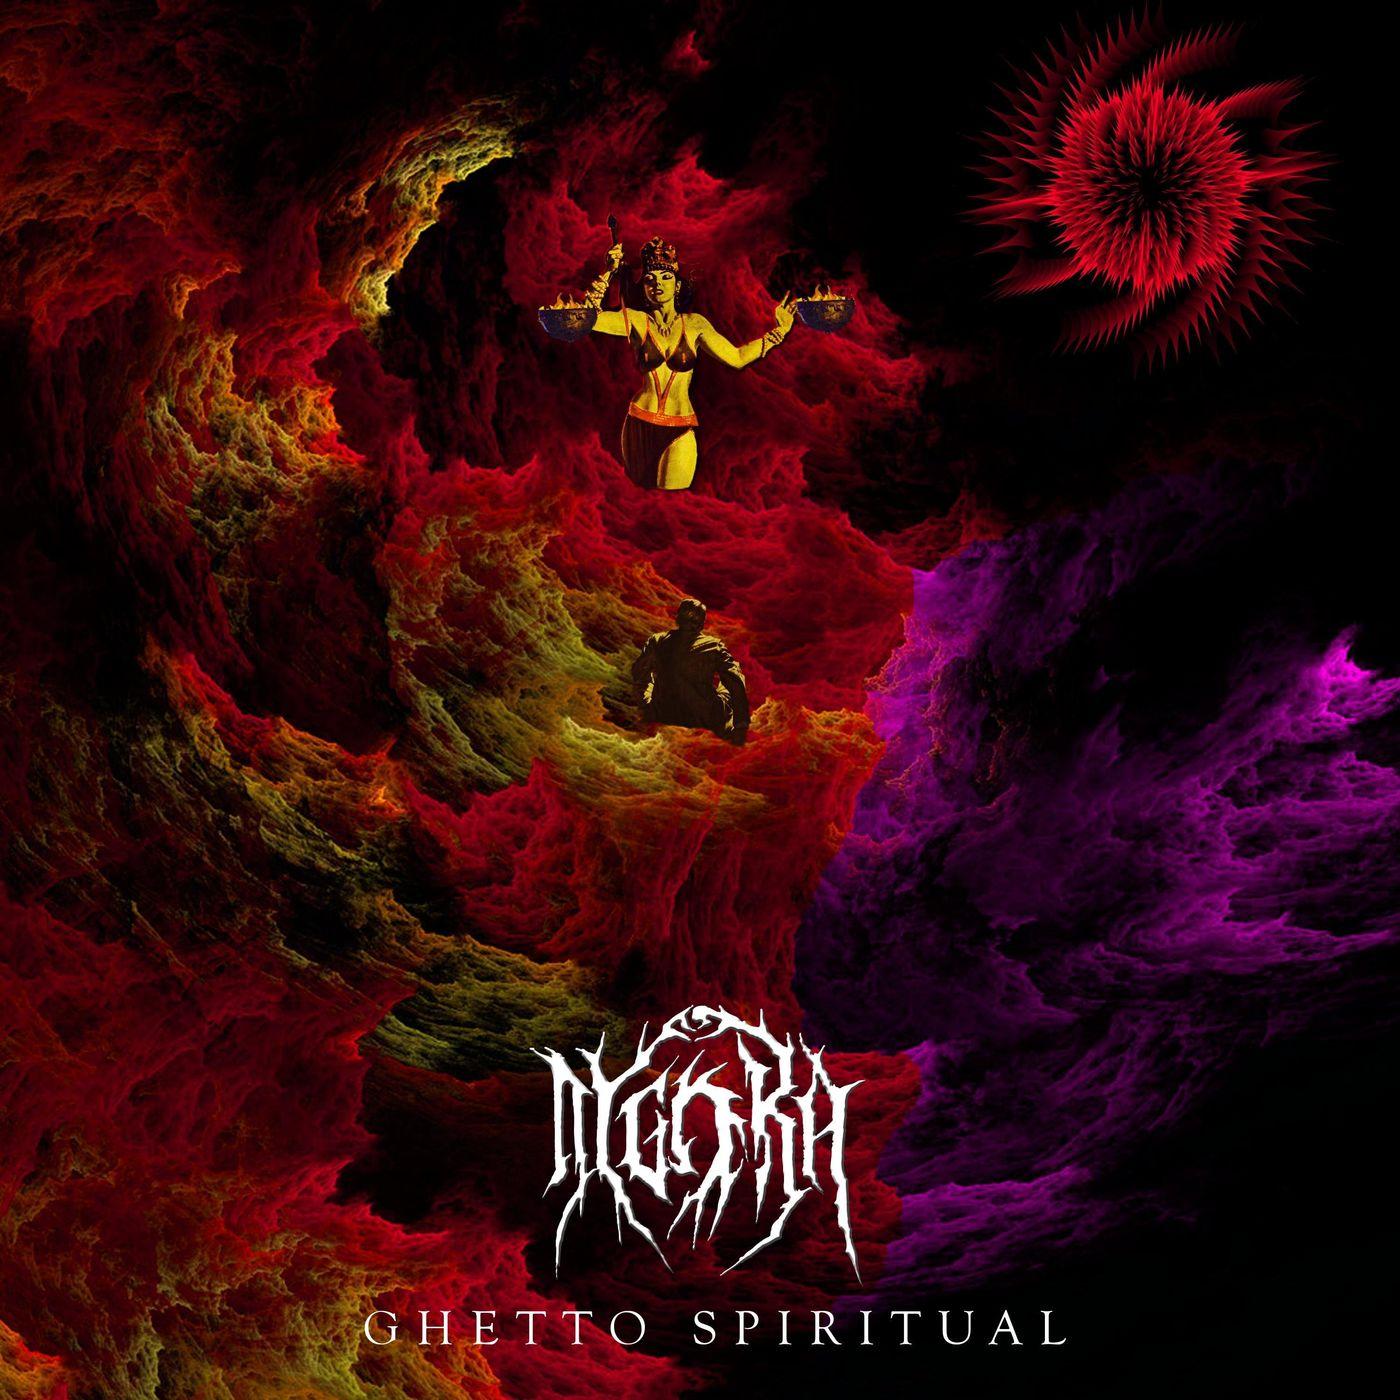 Dygora - Ghetto Spiritual [single] (2020)